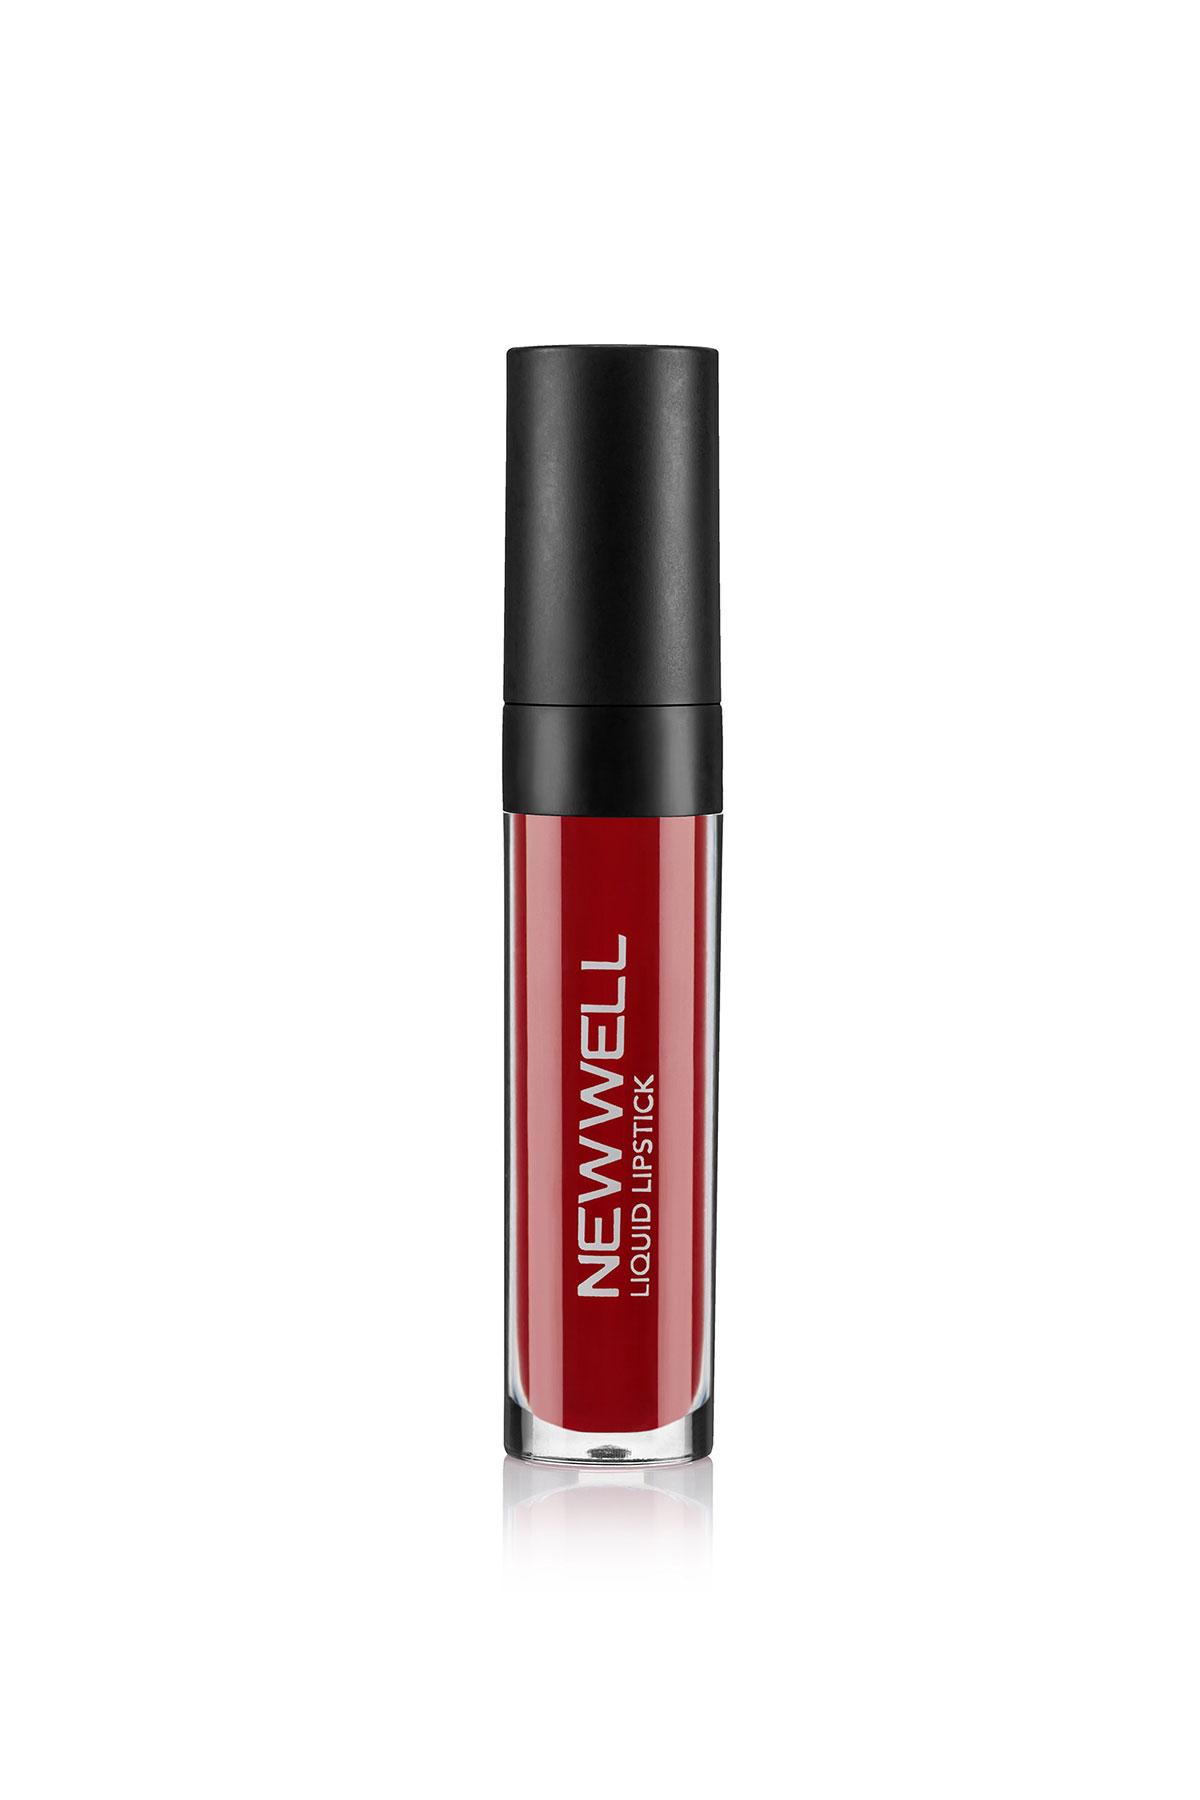 Newwell-Liquid-Lipstick-215 Duftzwillinge, Parfum Dupes, Duftzwilling, Parfum Dupe, Duftalternative, Parfumzwillinge, Parfum liste, Duftzwillinge Liste